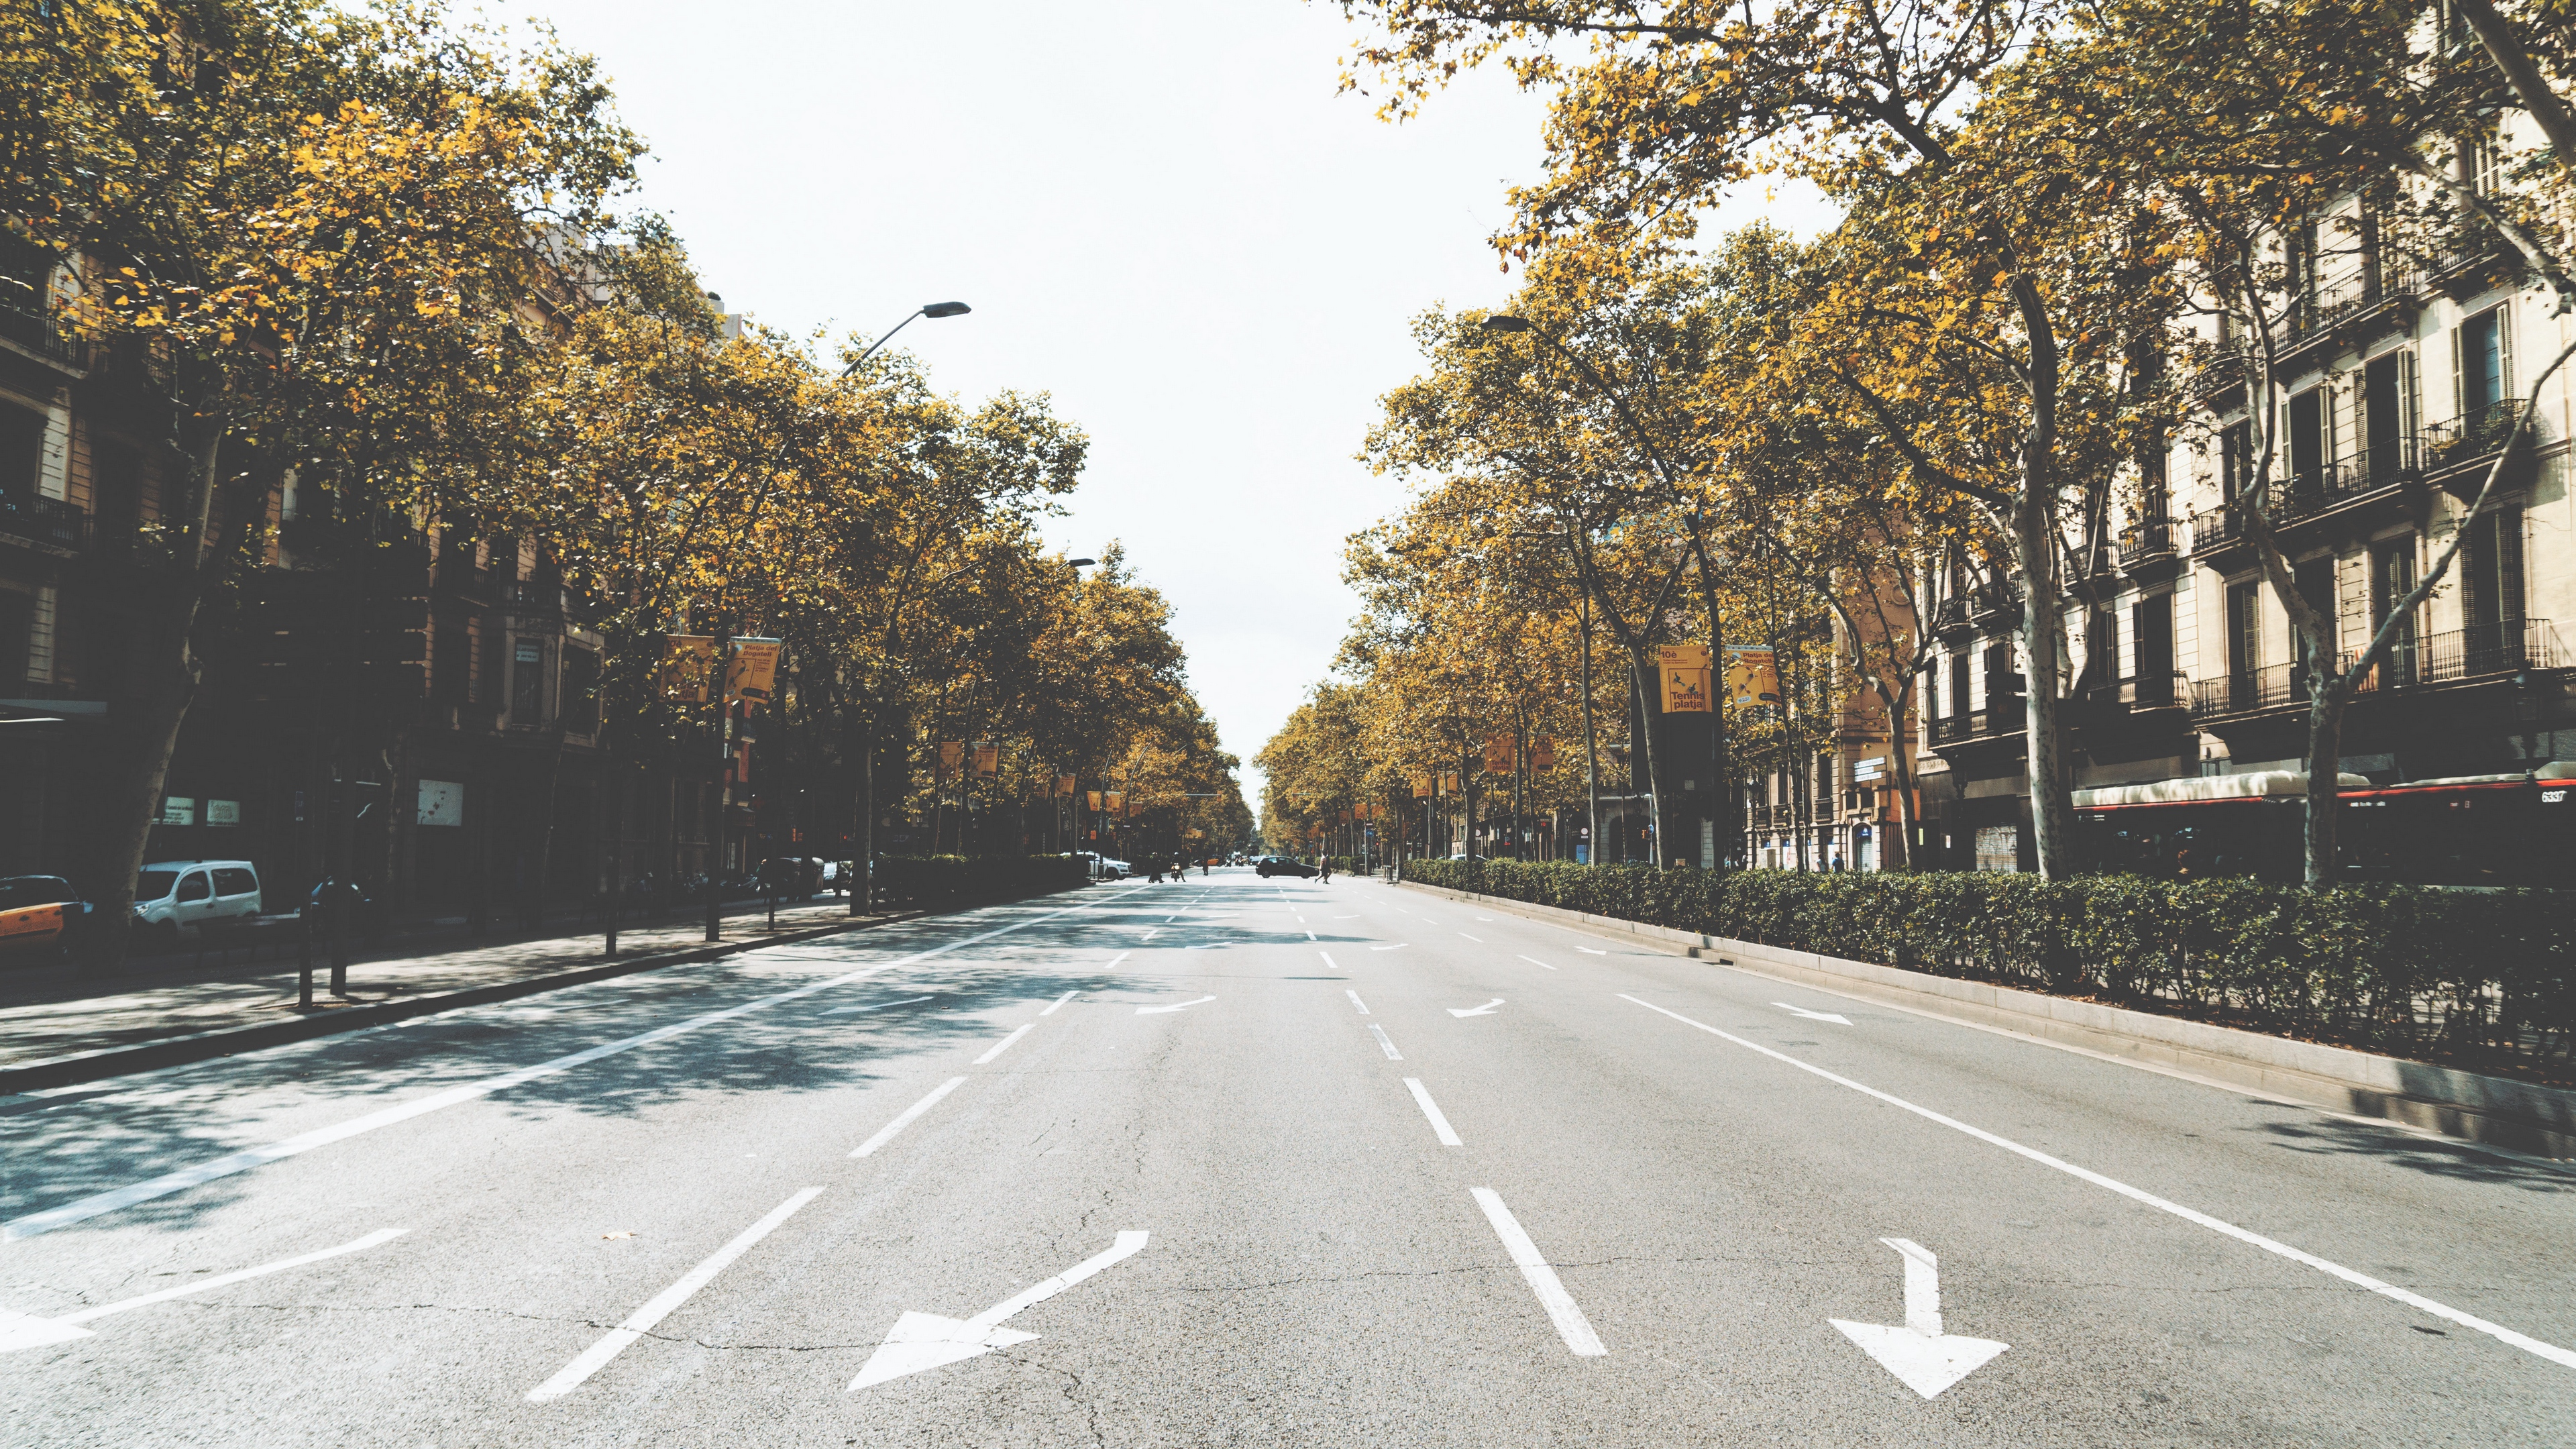 street city road marking 4k 1538068885 - street, city, road, marking 4k - Street, Road, City